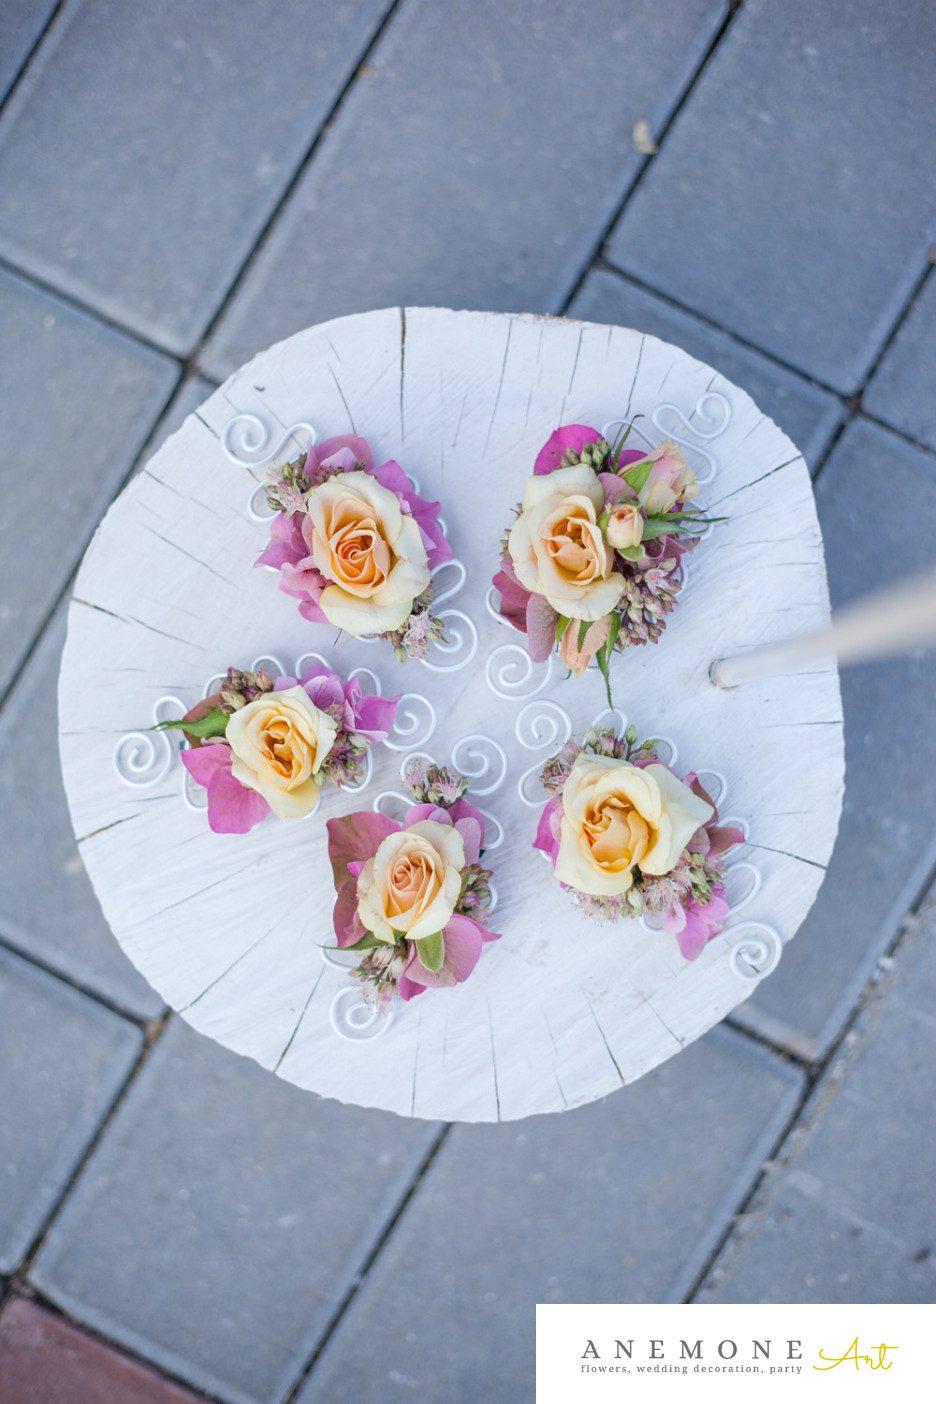 Poza, foto cu Flori de nunta cocarda, piersica, roz in Arad, Timisoara, Oradea (wedding flowers, bouquets) nunta Arad, Timisoara, Oradea